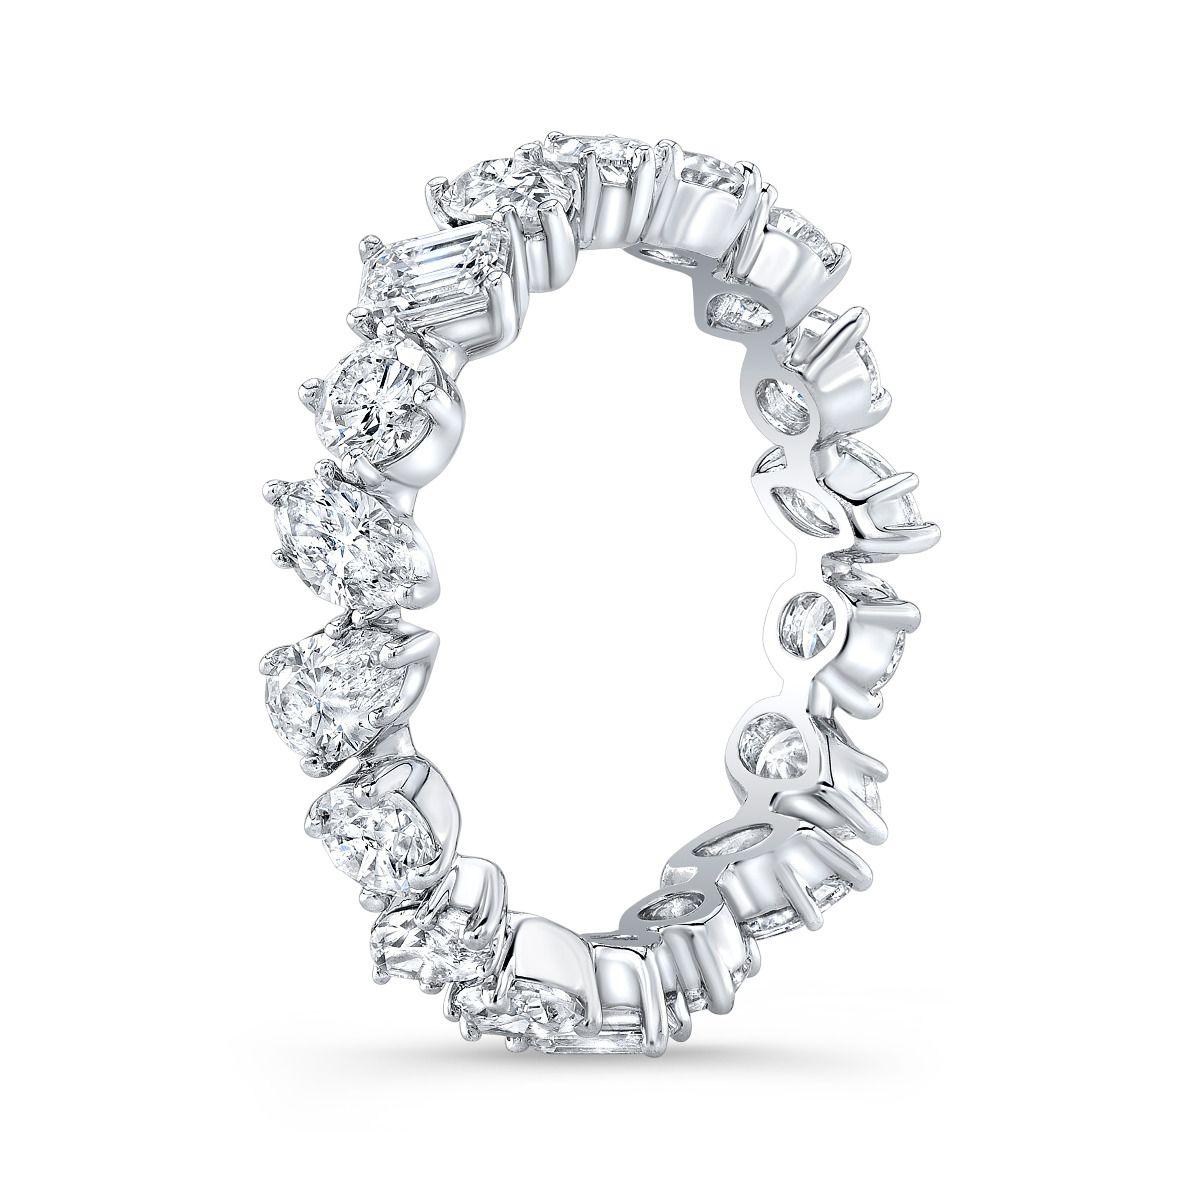 2.80 Carats Mixed Shaped Diamond Eternity Band